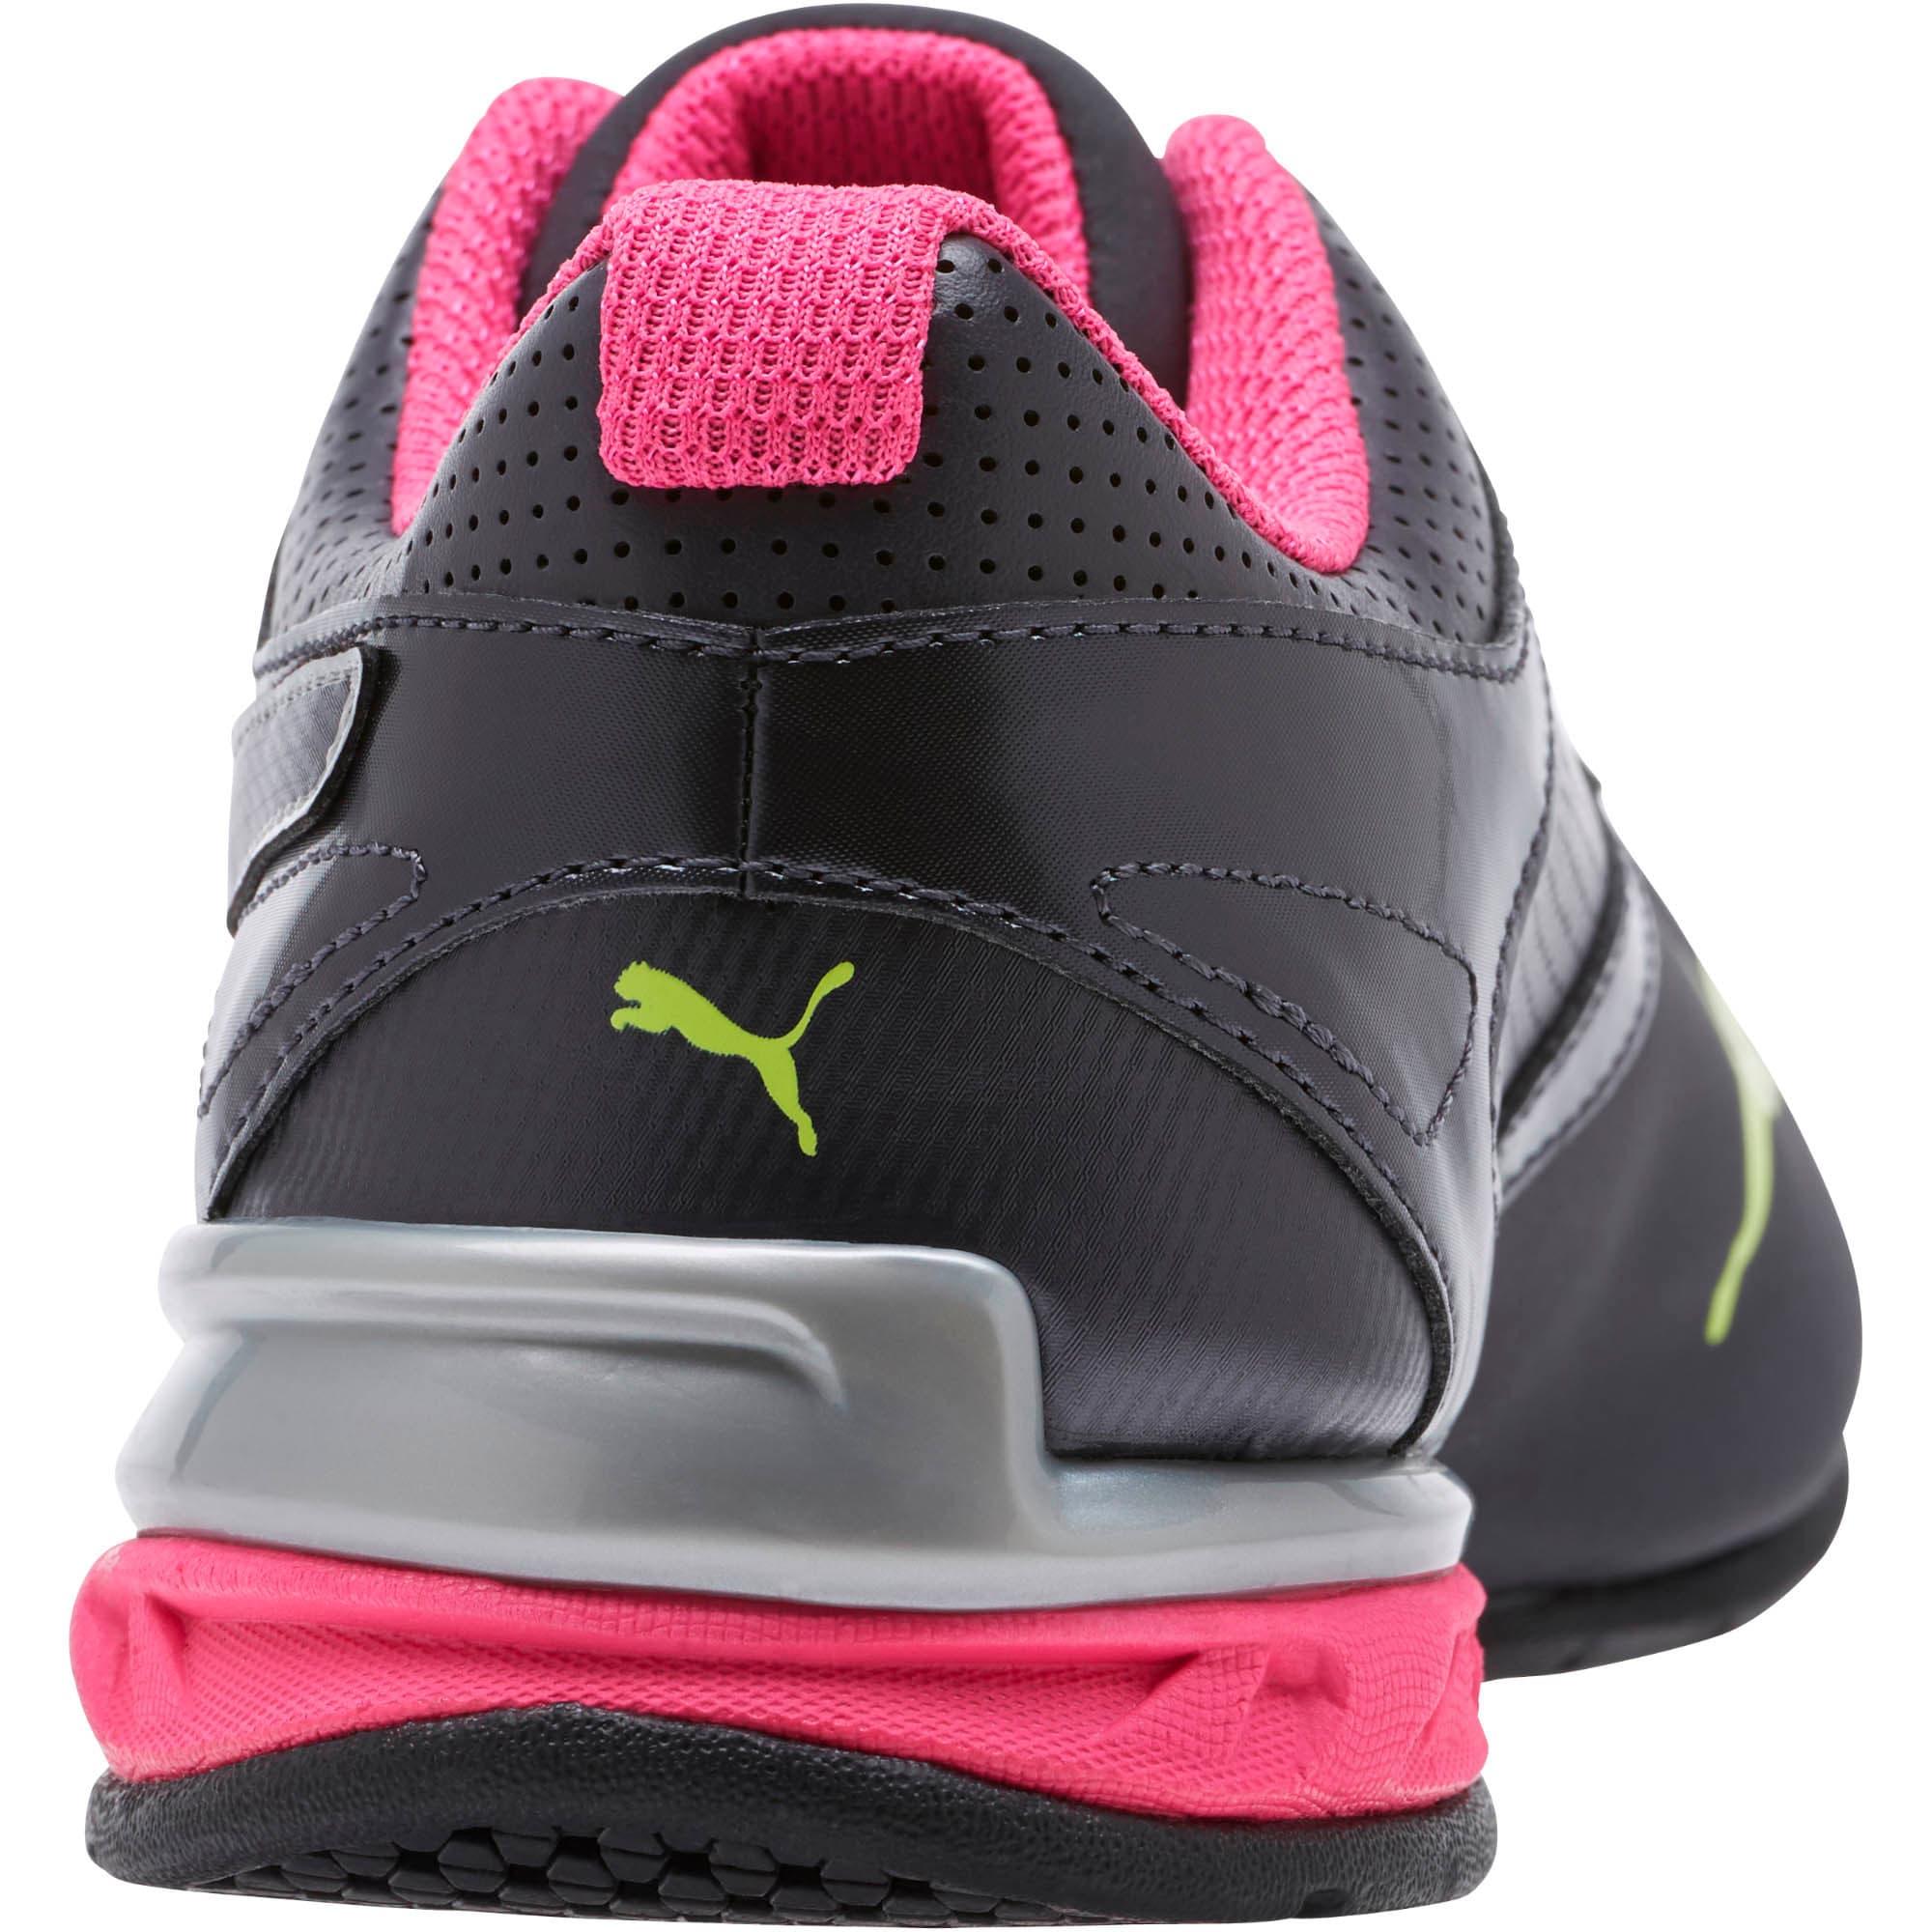 Thumbnail 4 of Tazon 6 FM Women's Sneakers, Periscope-Silver-Pink Glo, medium